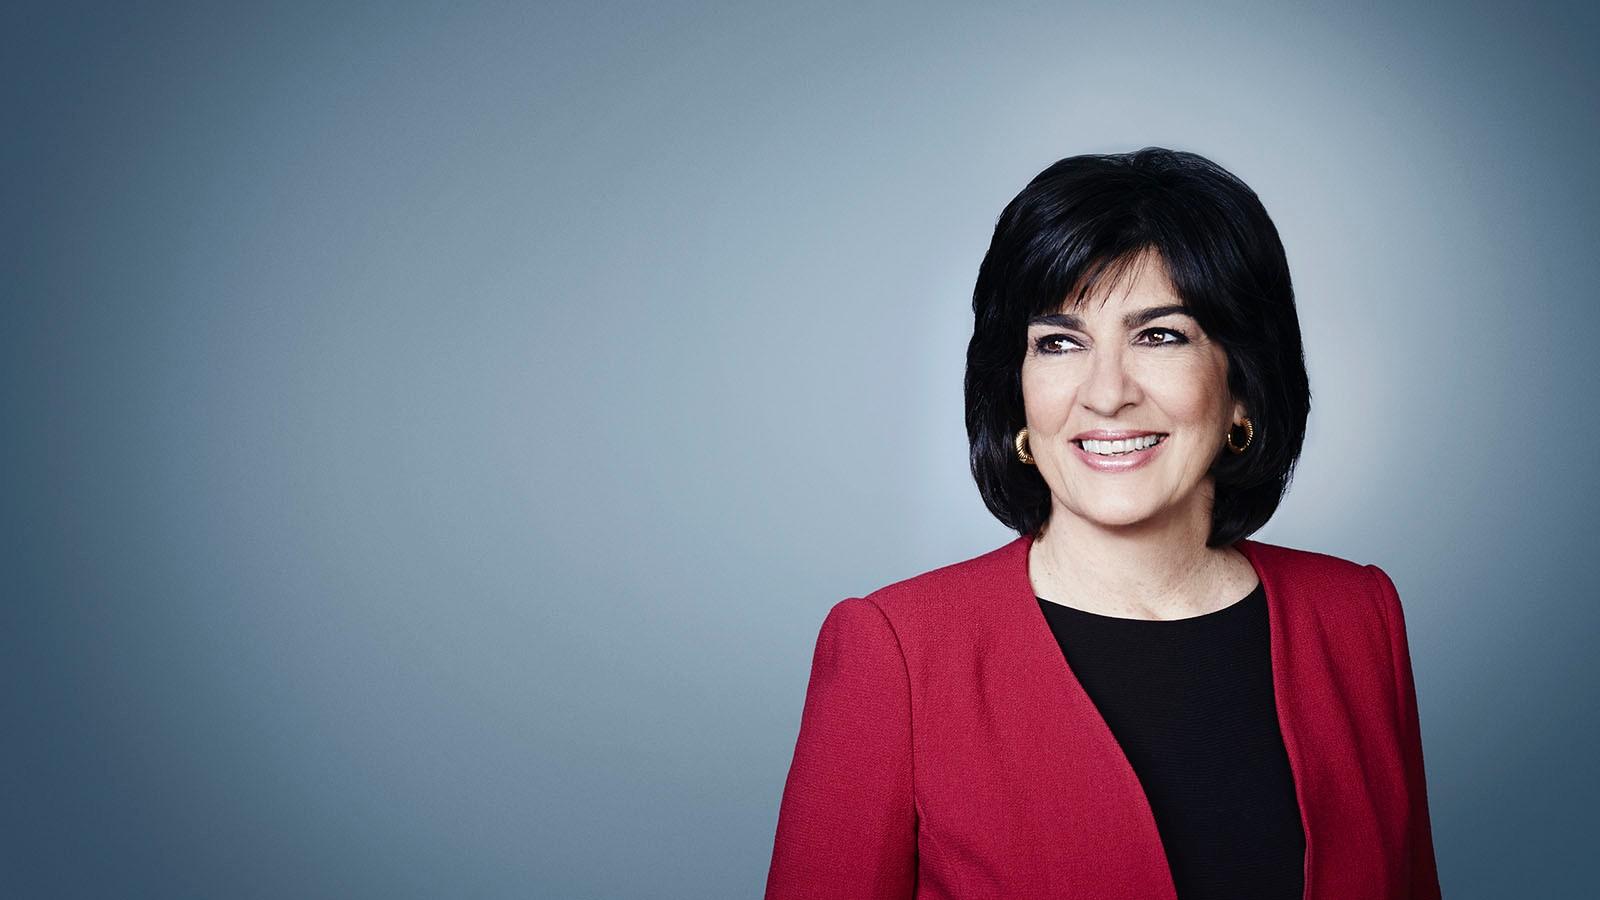 CNN Profiles - Christiane Amanpour - Anchor and Chief ... - photo#28